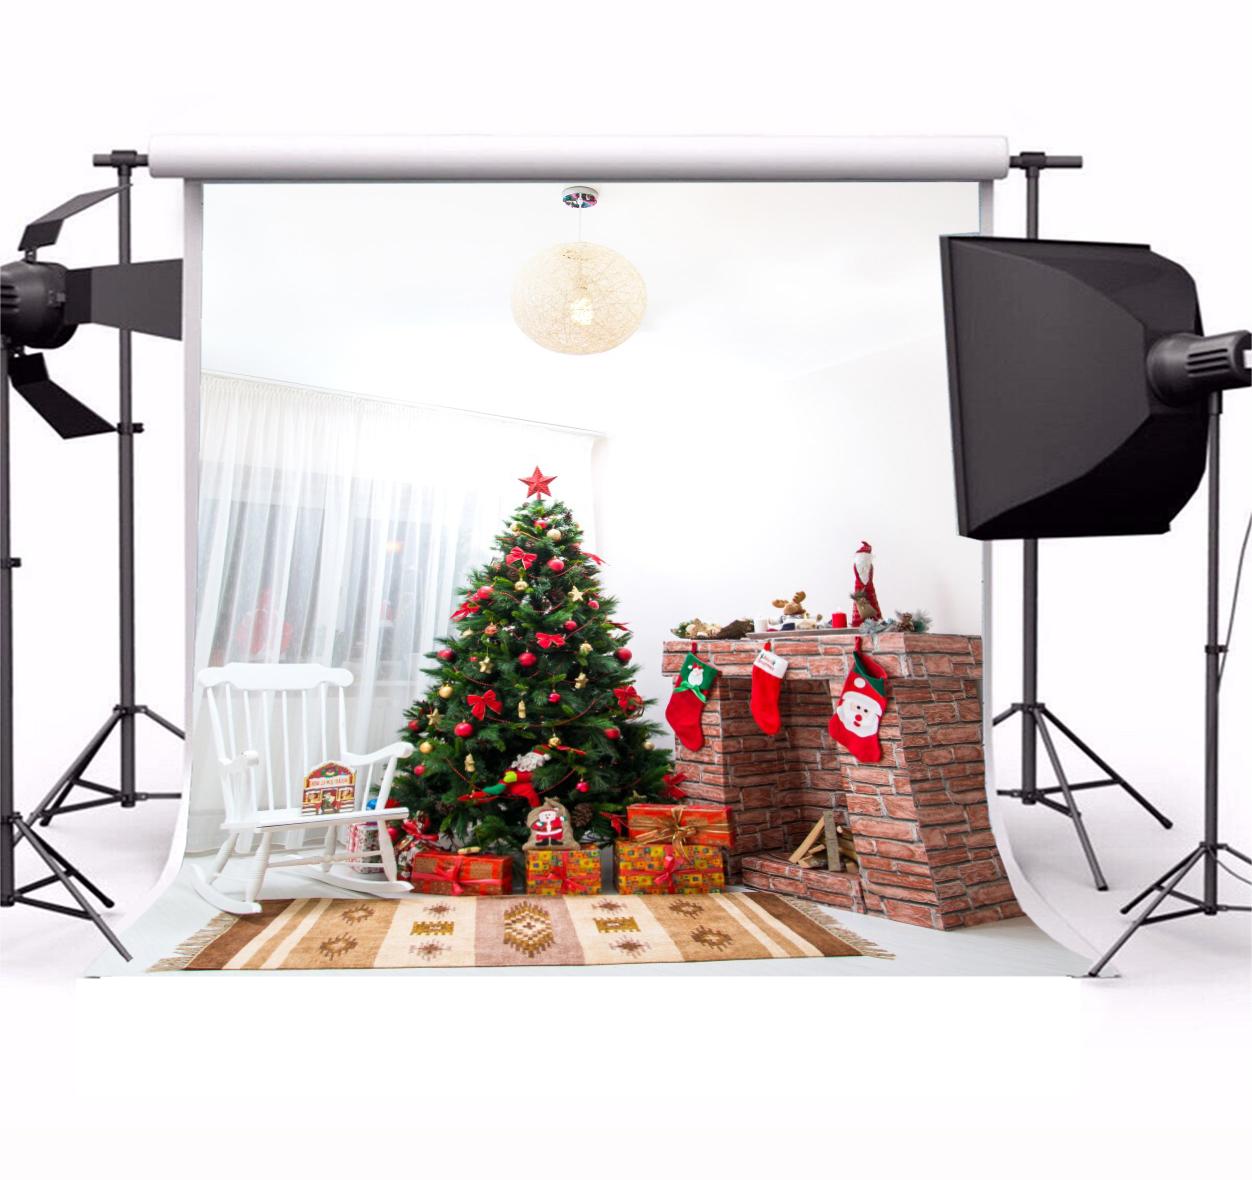 Indoor Xmas Tree Rustic Brick Fireplace Backdrop Vinyl 8x8ft Baby ...